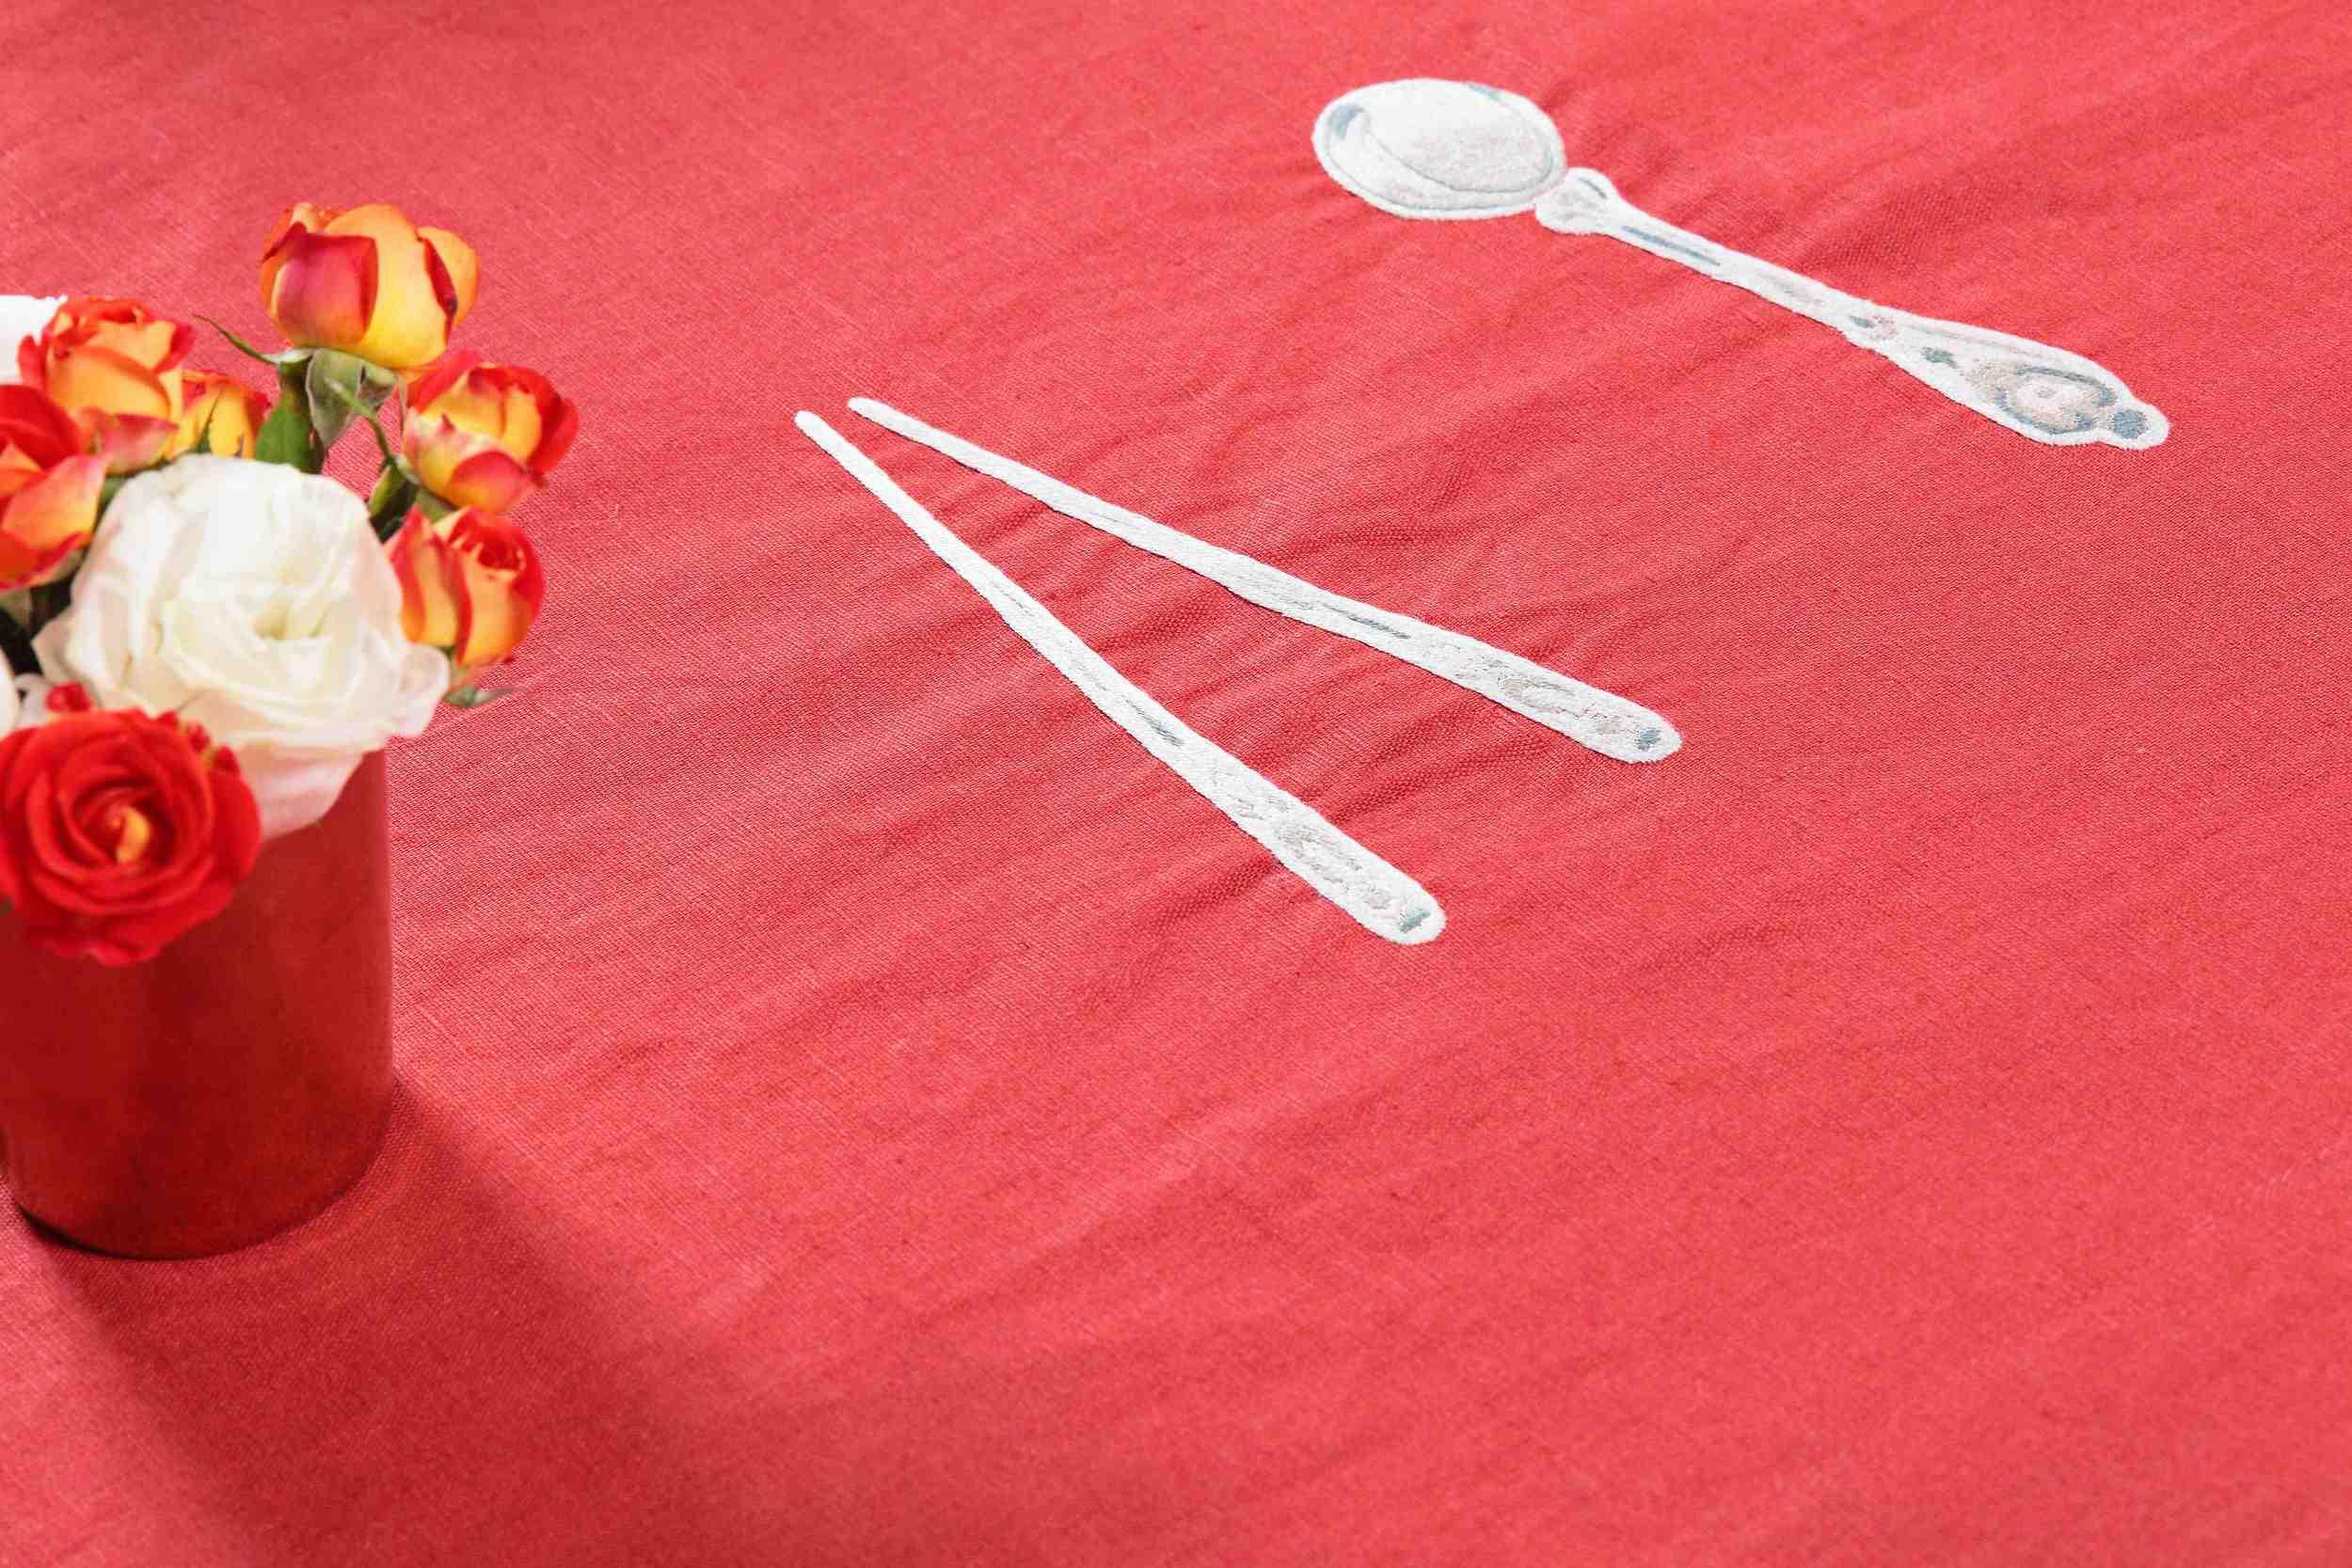 Chopstick_1.jpg